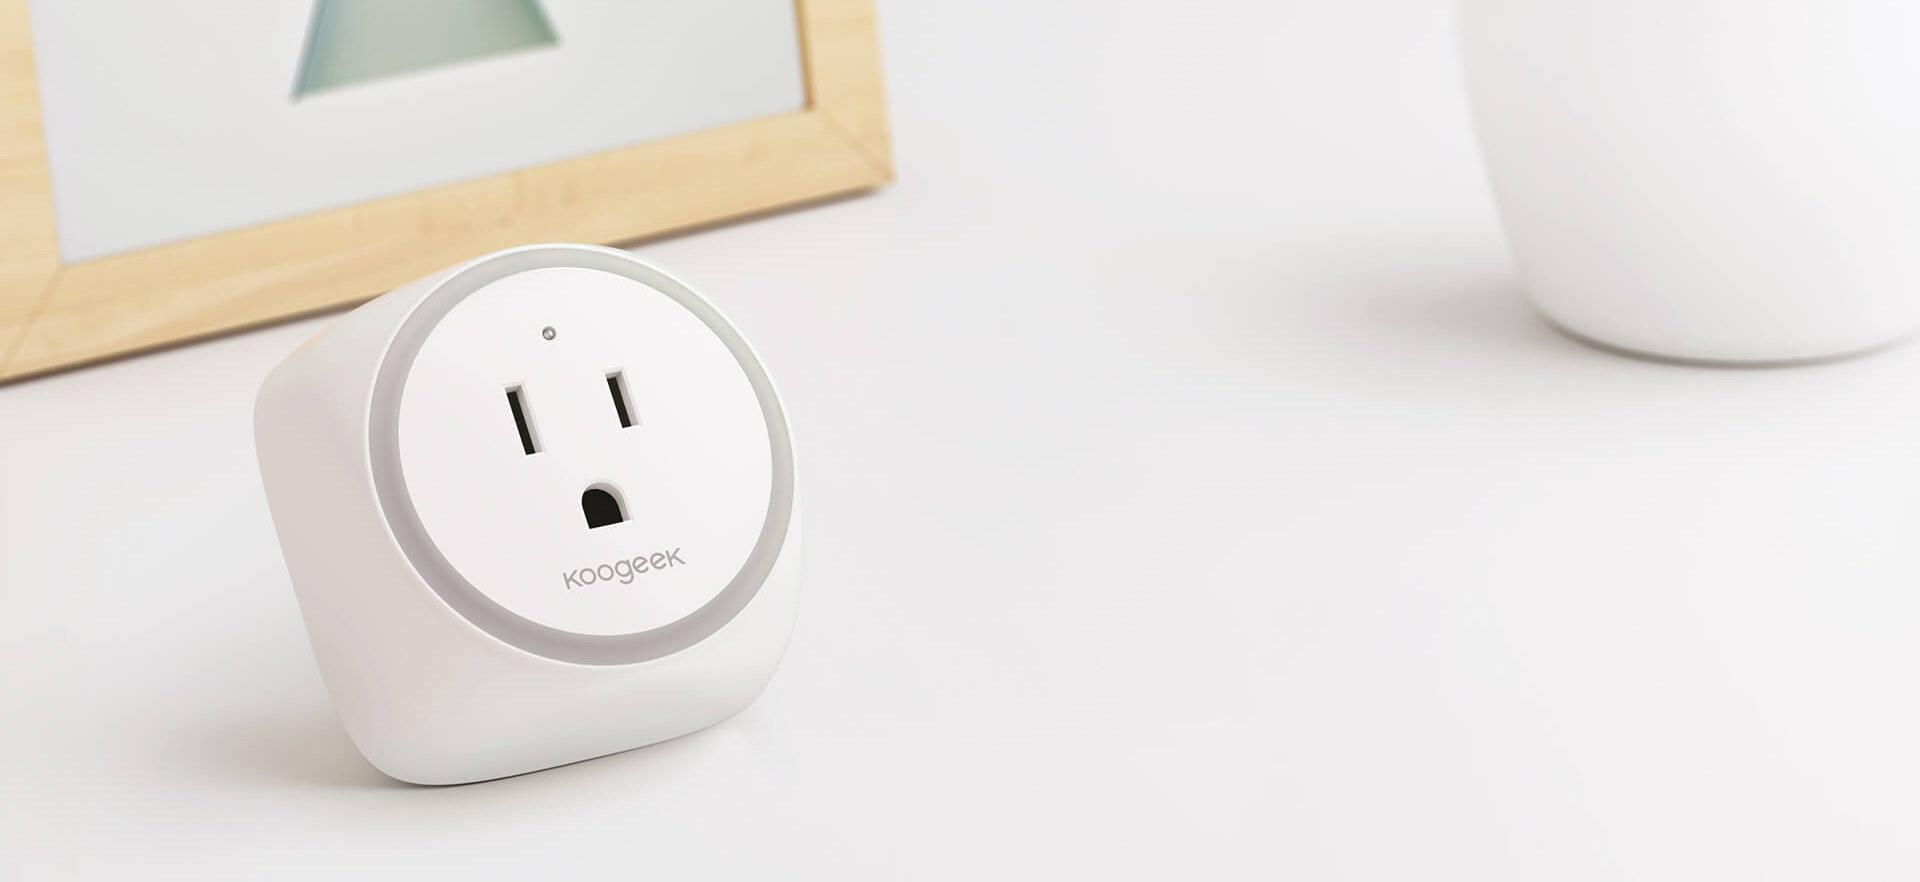 P3 Plug white - Koogeek com